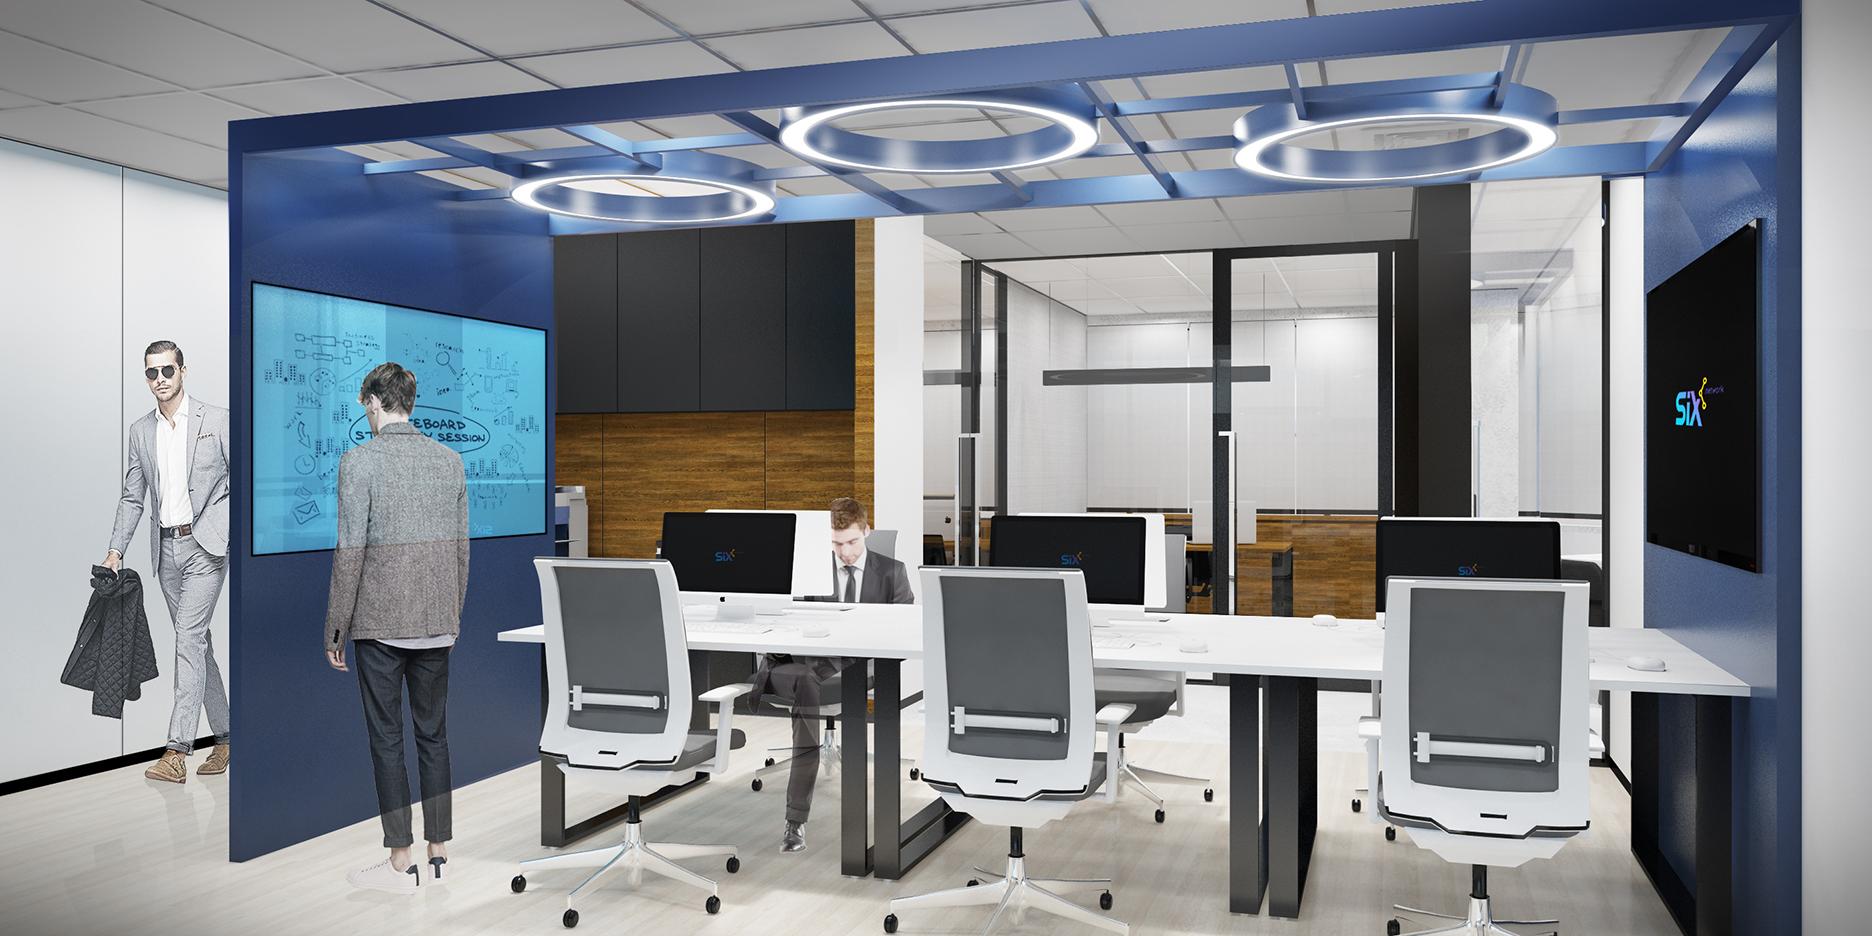 six network office 10 design sketch 2